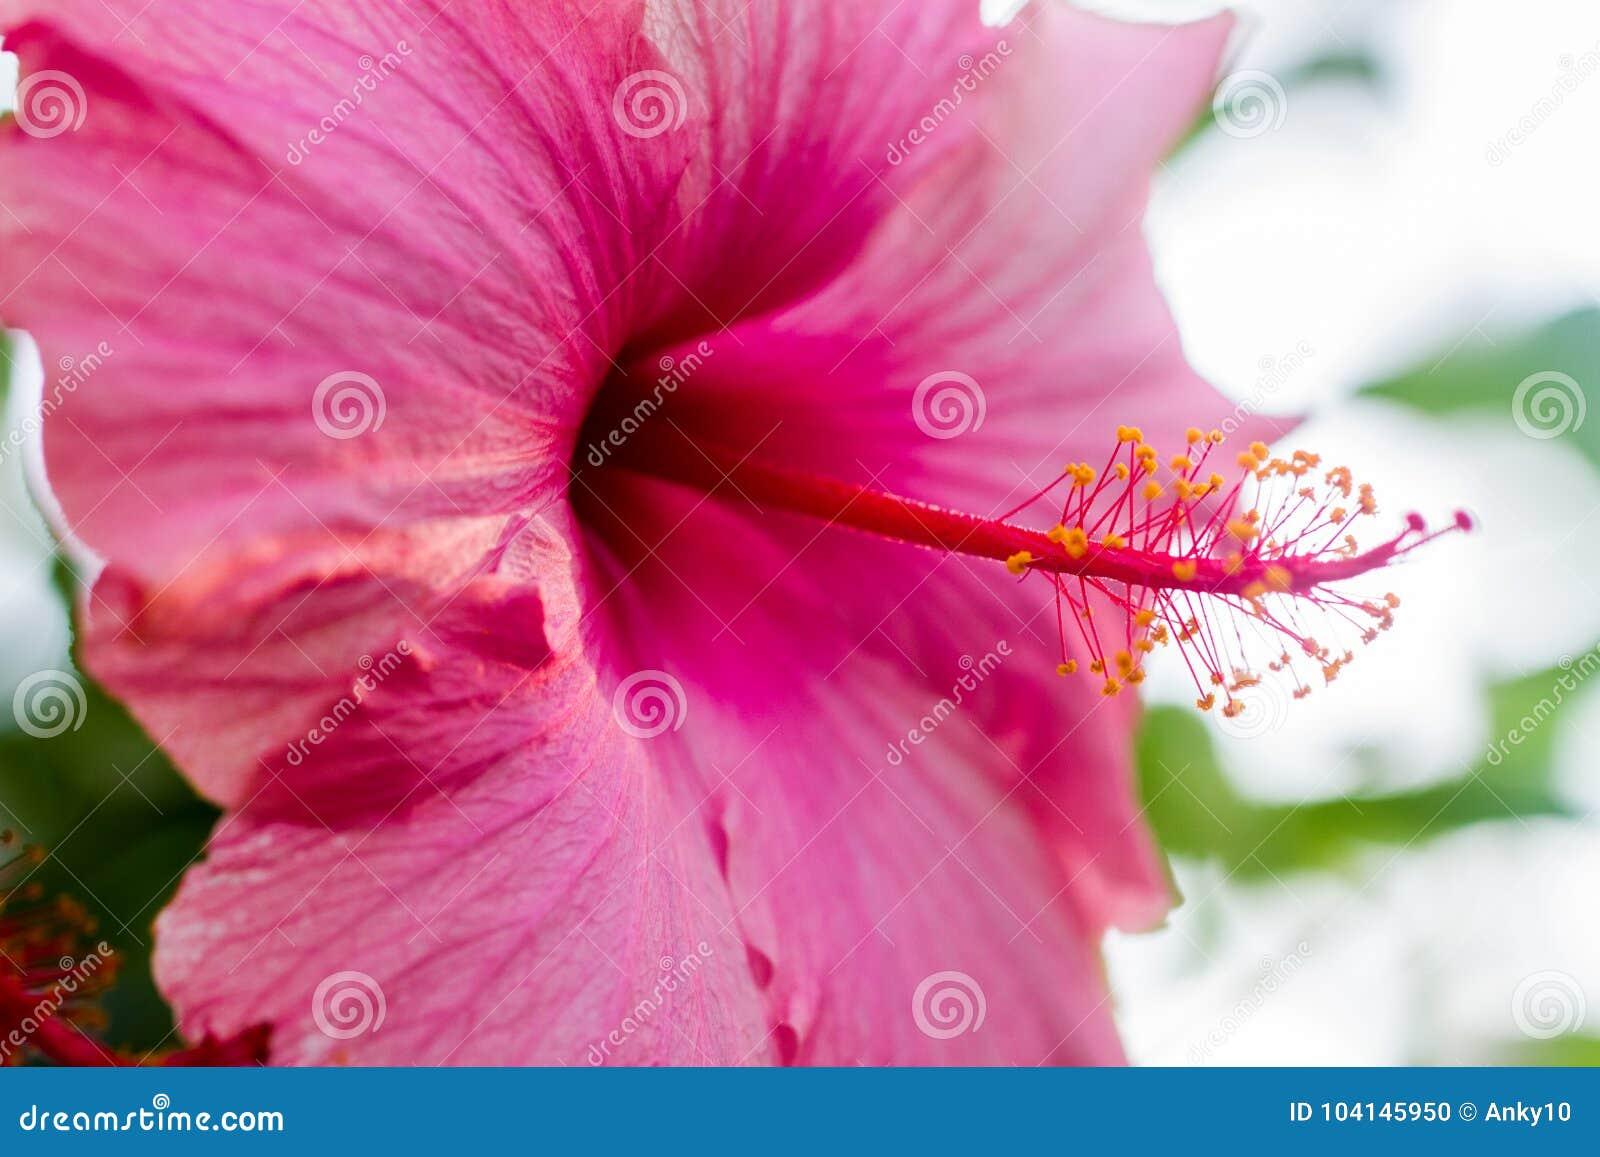 Hibiscus rose mallow over blue sky stock photo image of closeup download comp izmirmasajfo